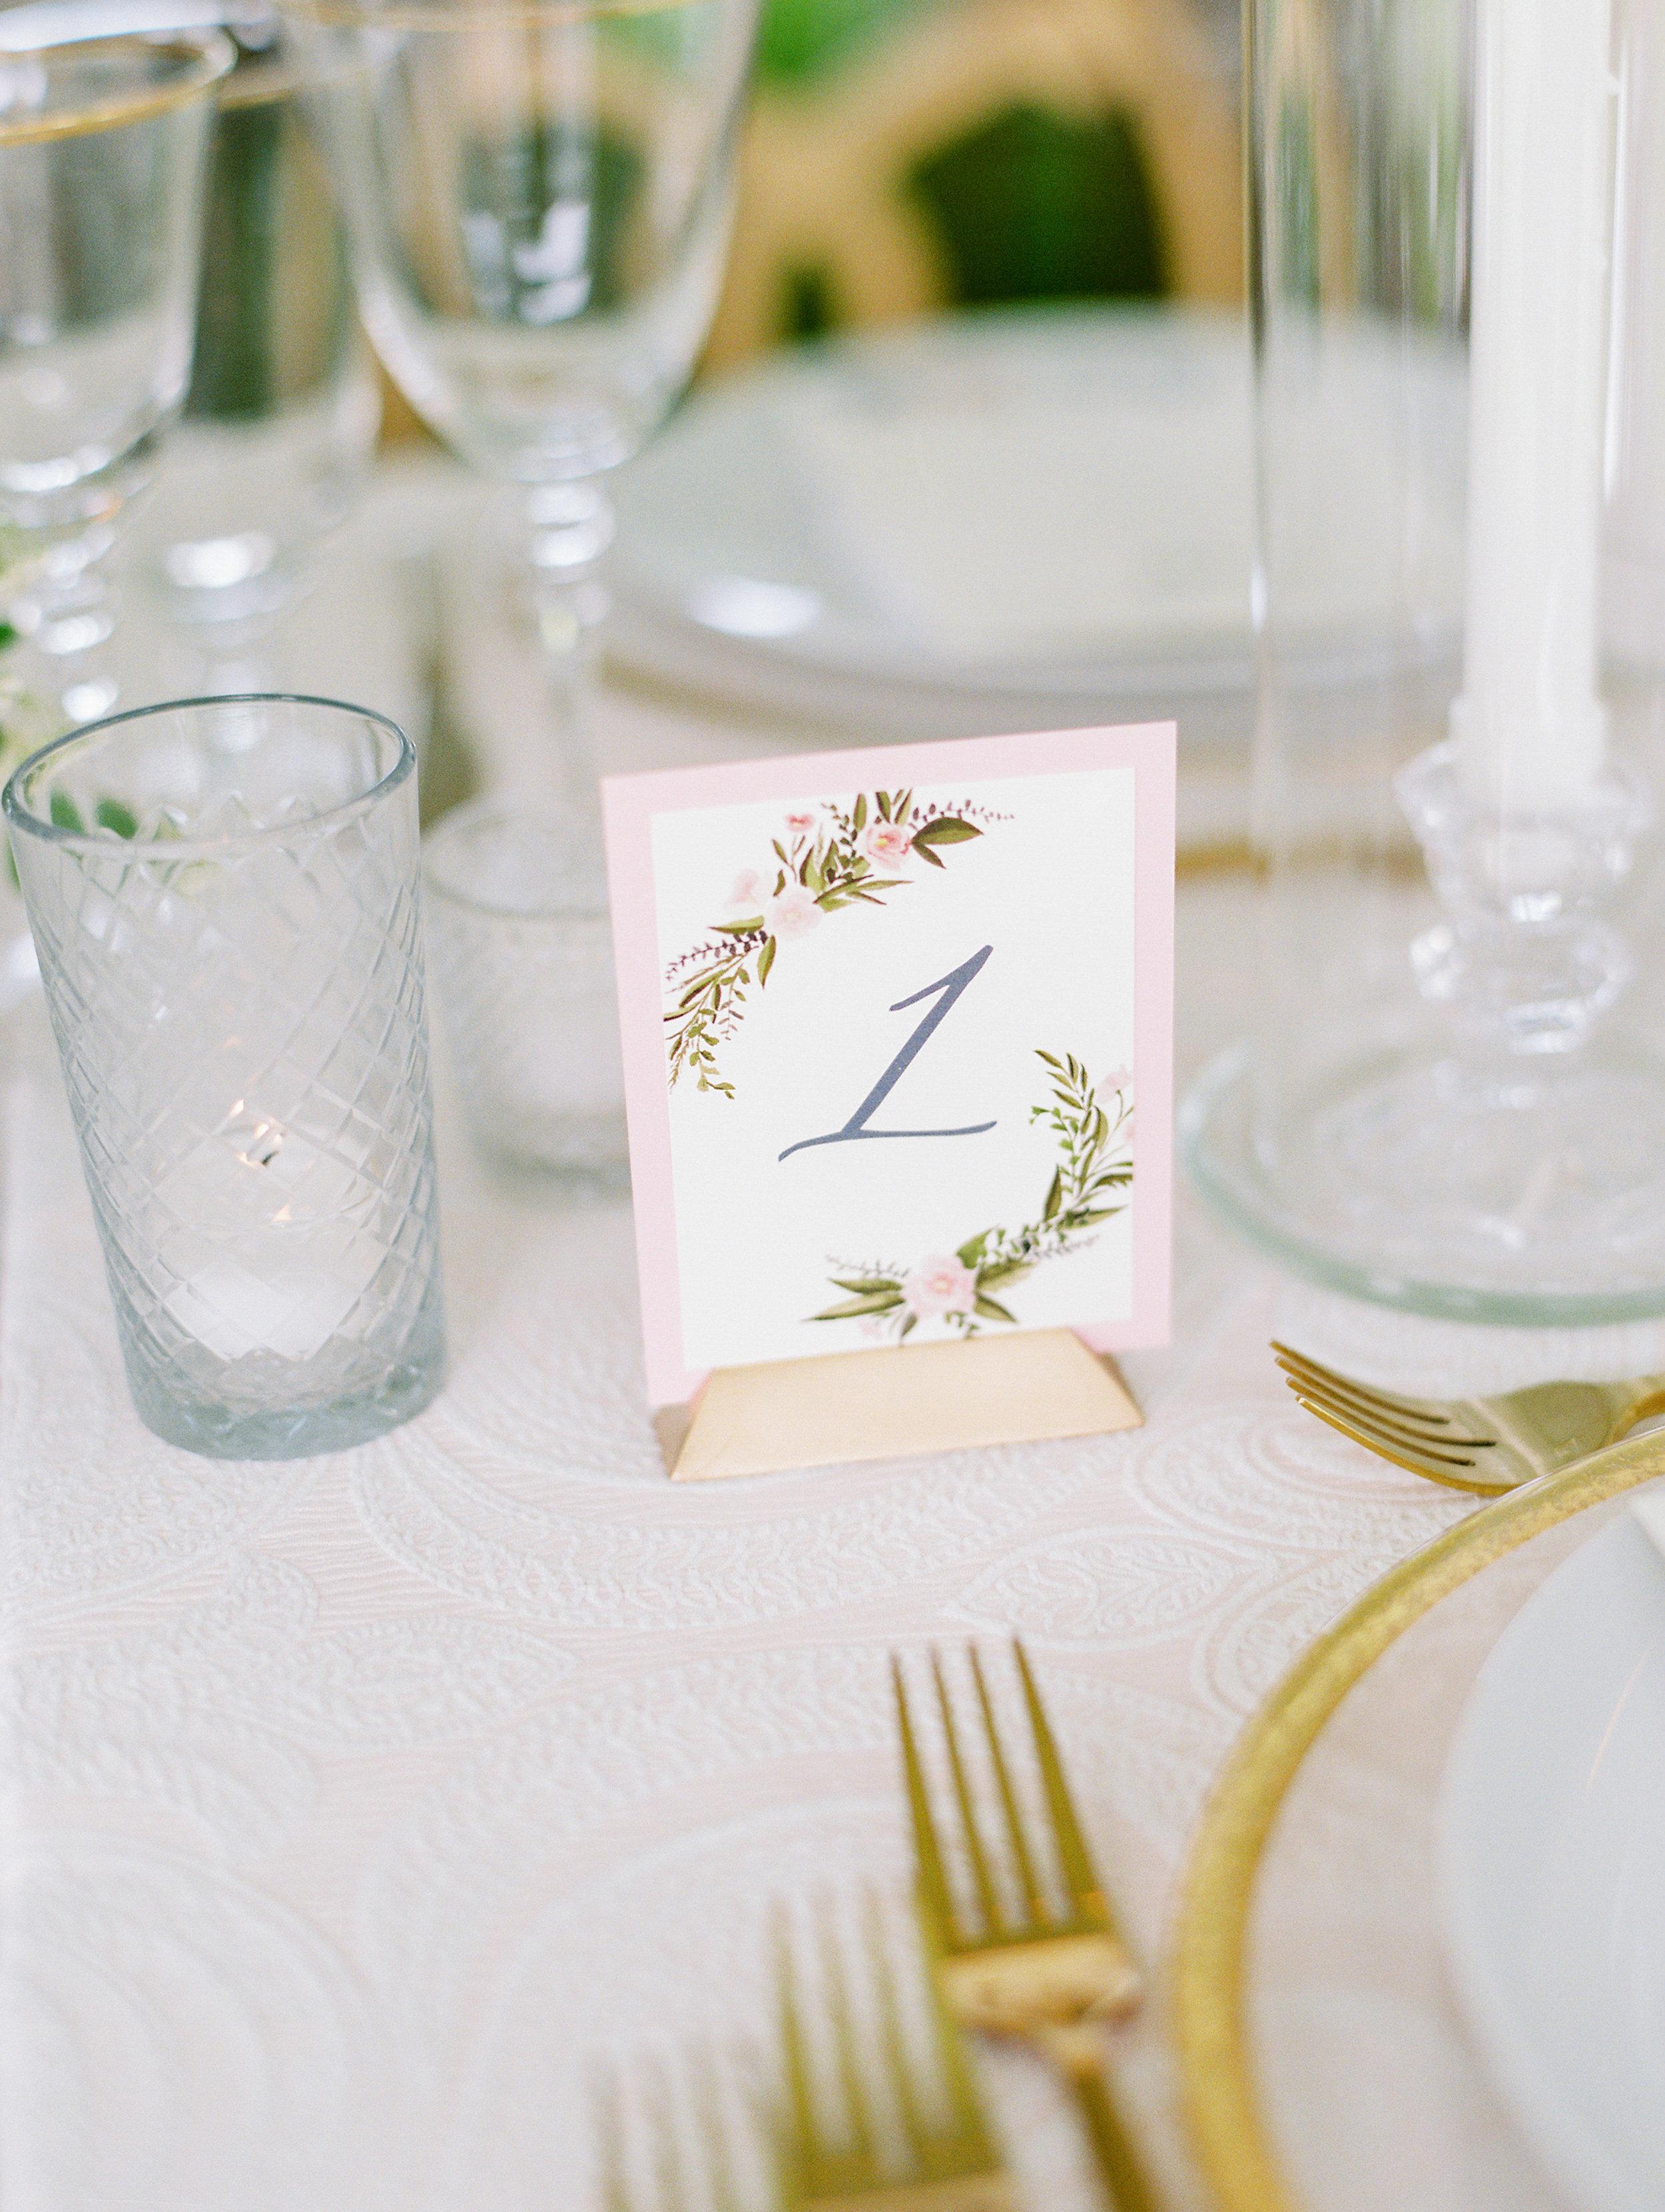 Coffman+Wedding+Reception+Details-93.jpg